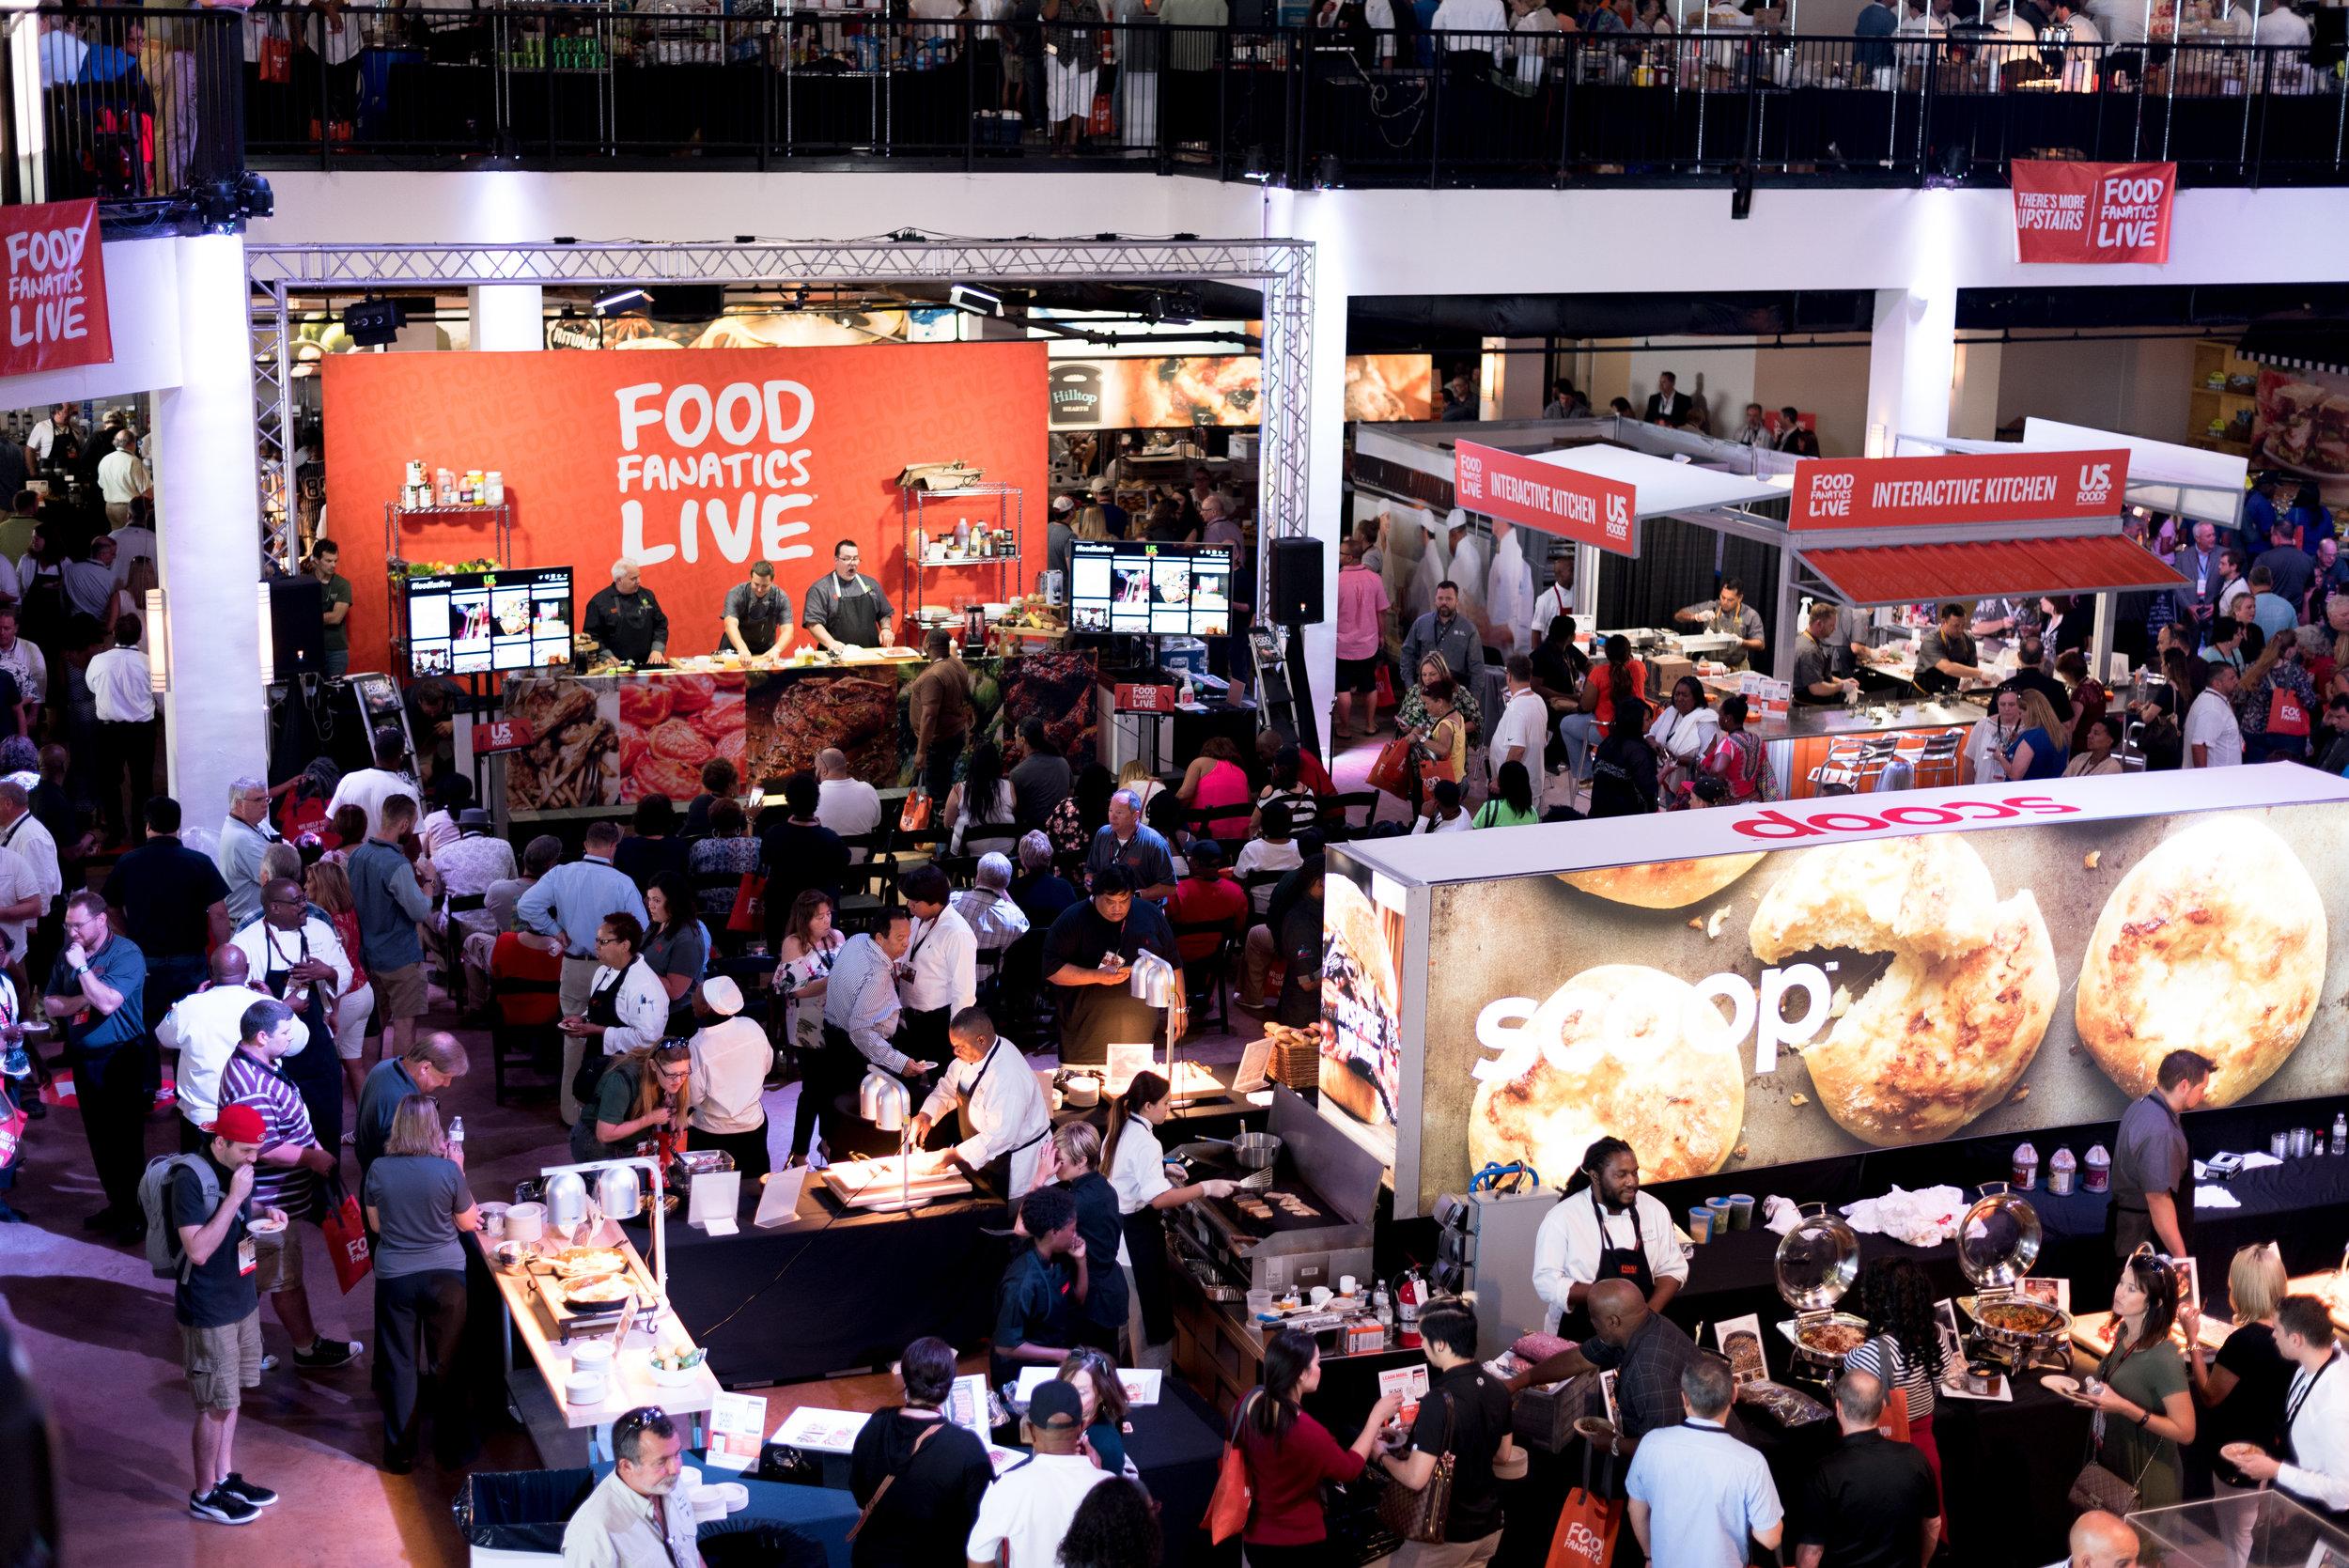 FoodFanaticsLive-Event-Food-Photography145.jpg